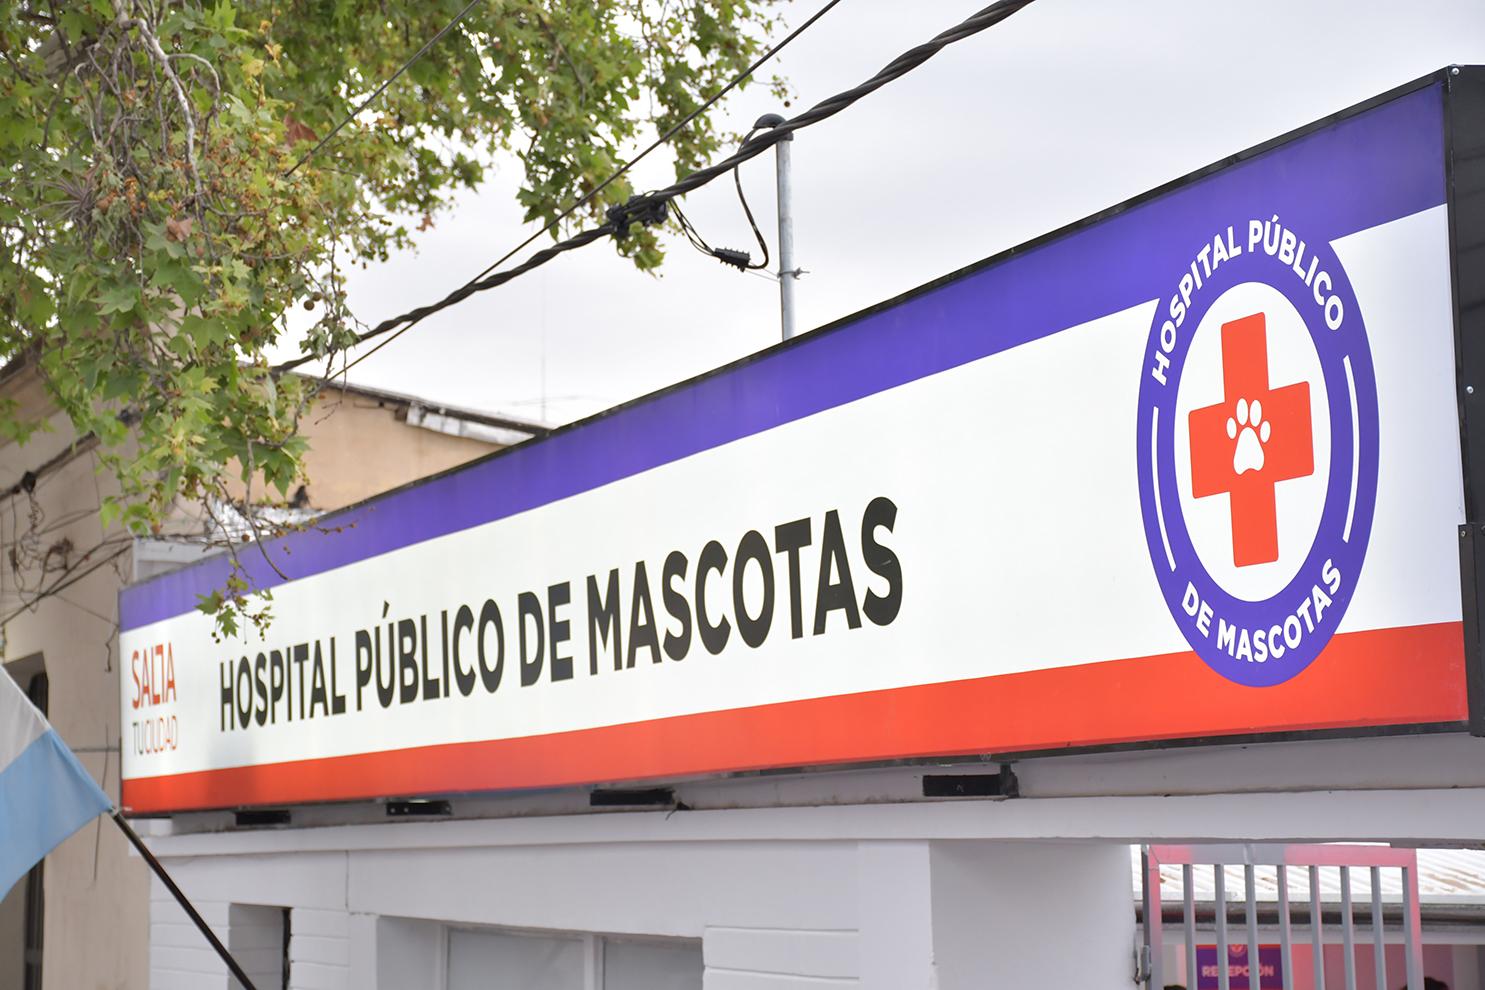 Hospital Público de Mascotas - Foto: municipalidadsalta.gob.ar